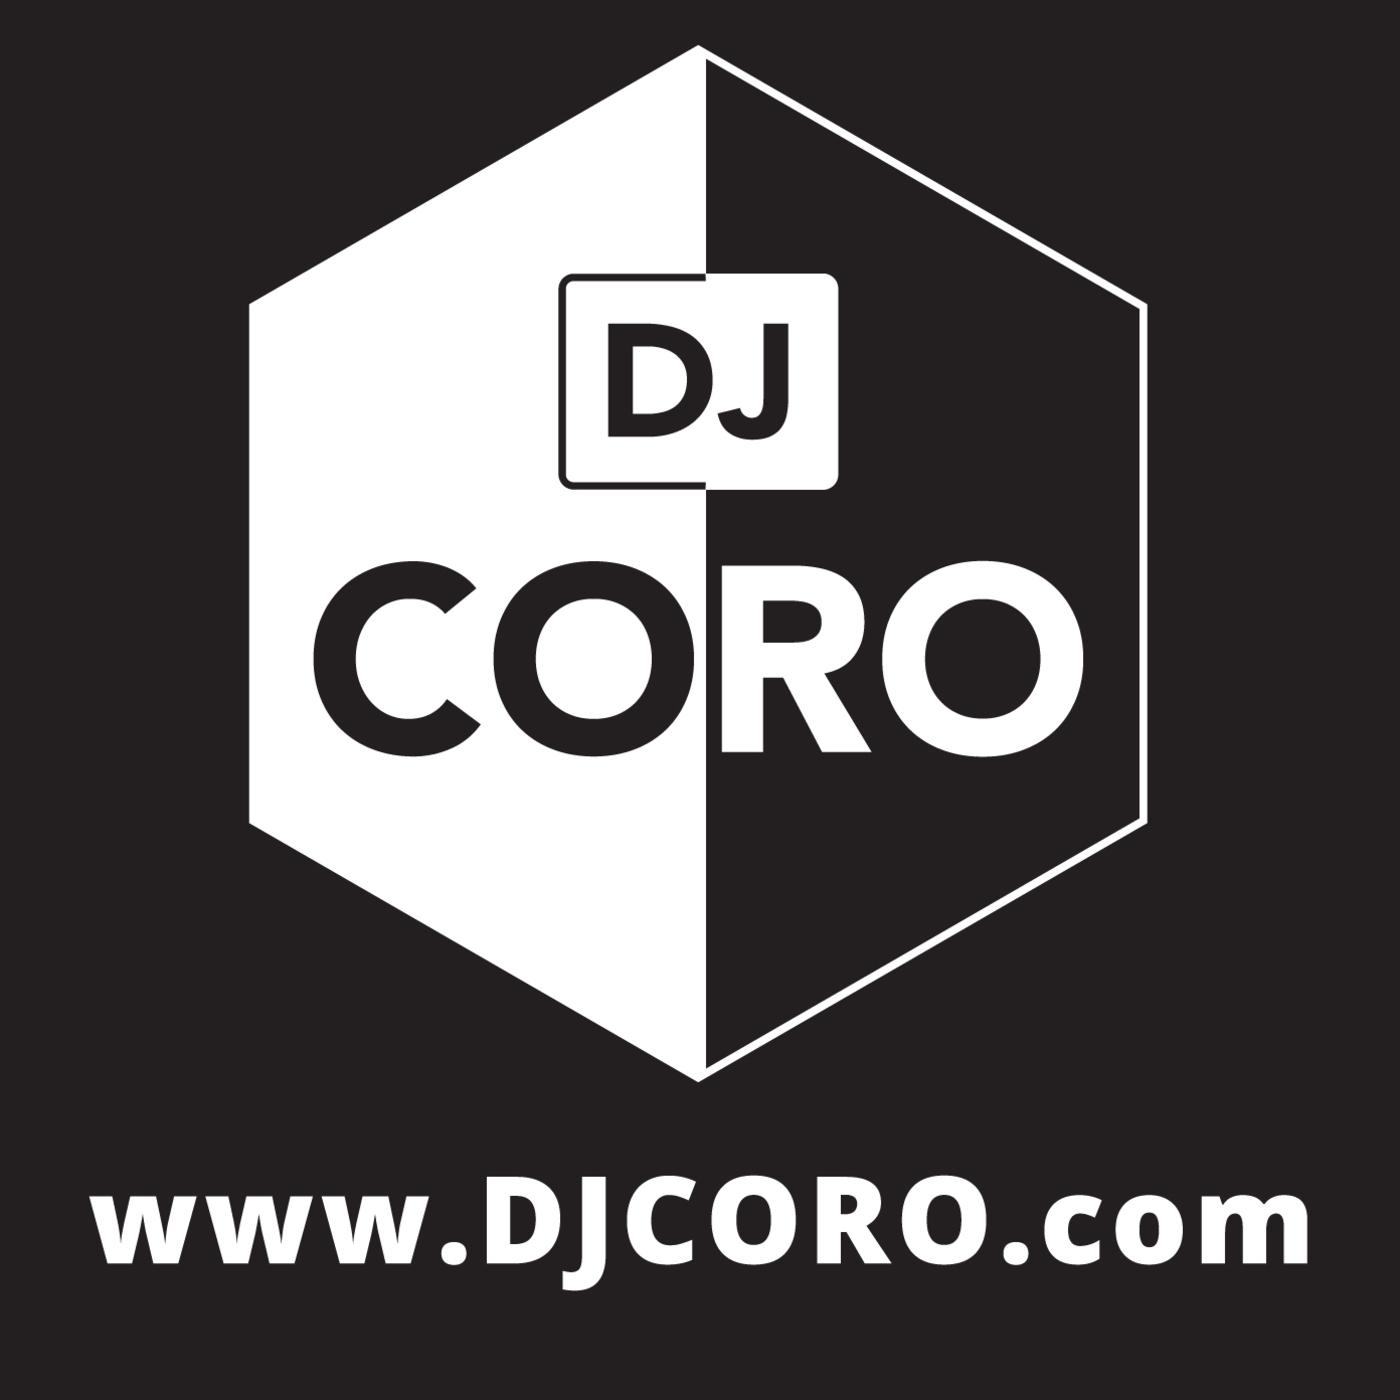 Uncategorized Archives - DJ Coro 2260ac13c65